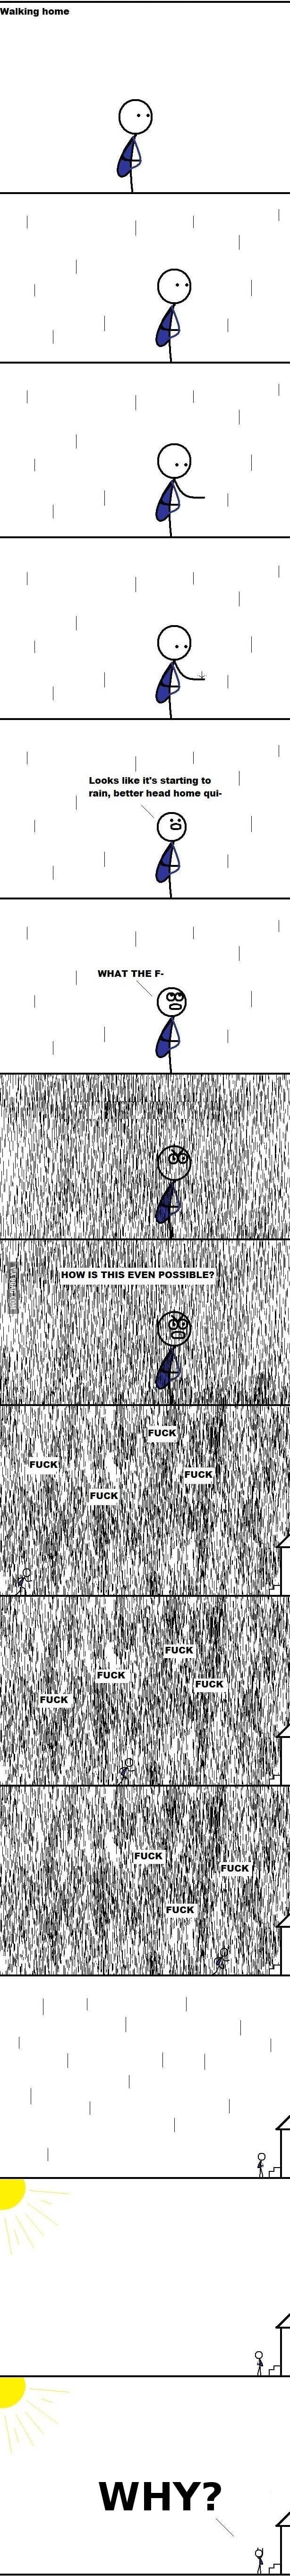 Why Rain?